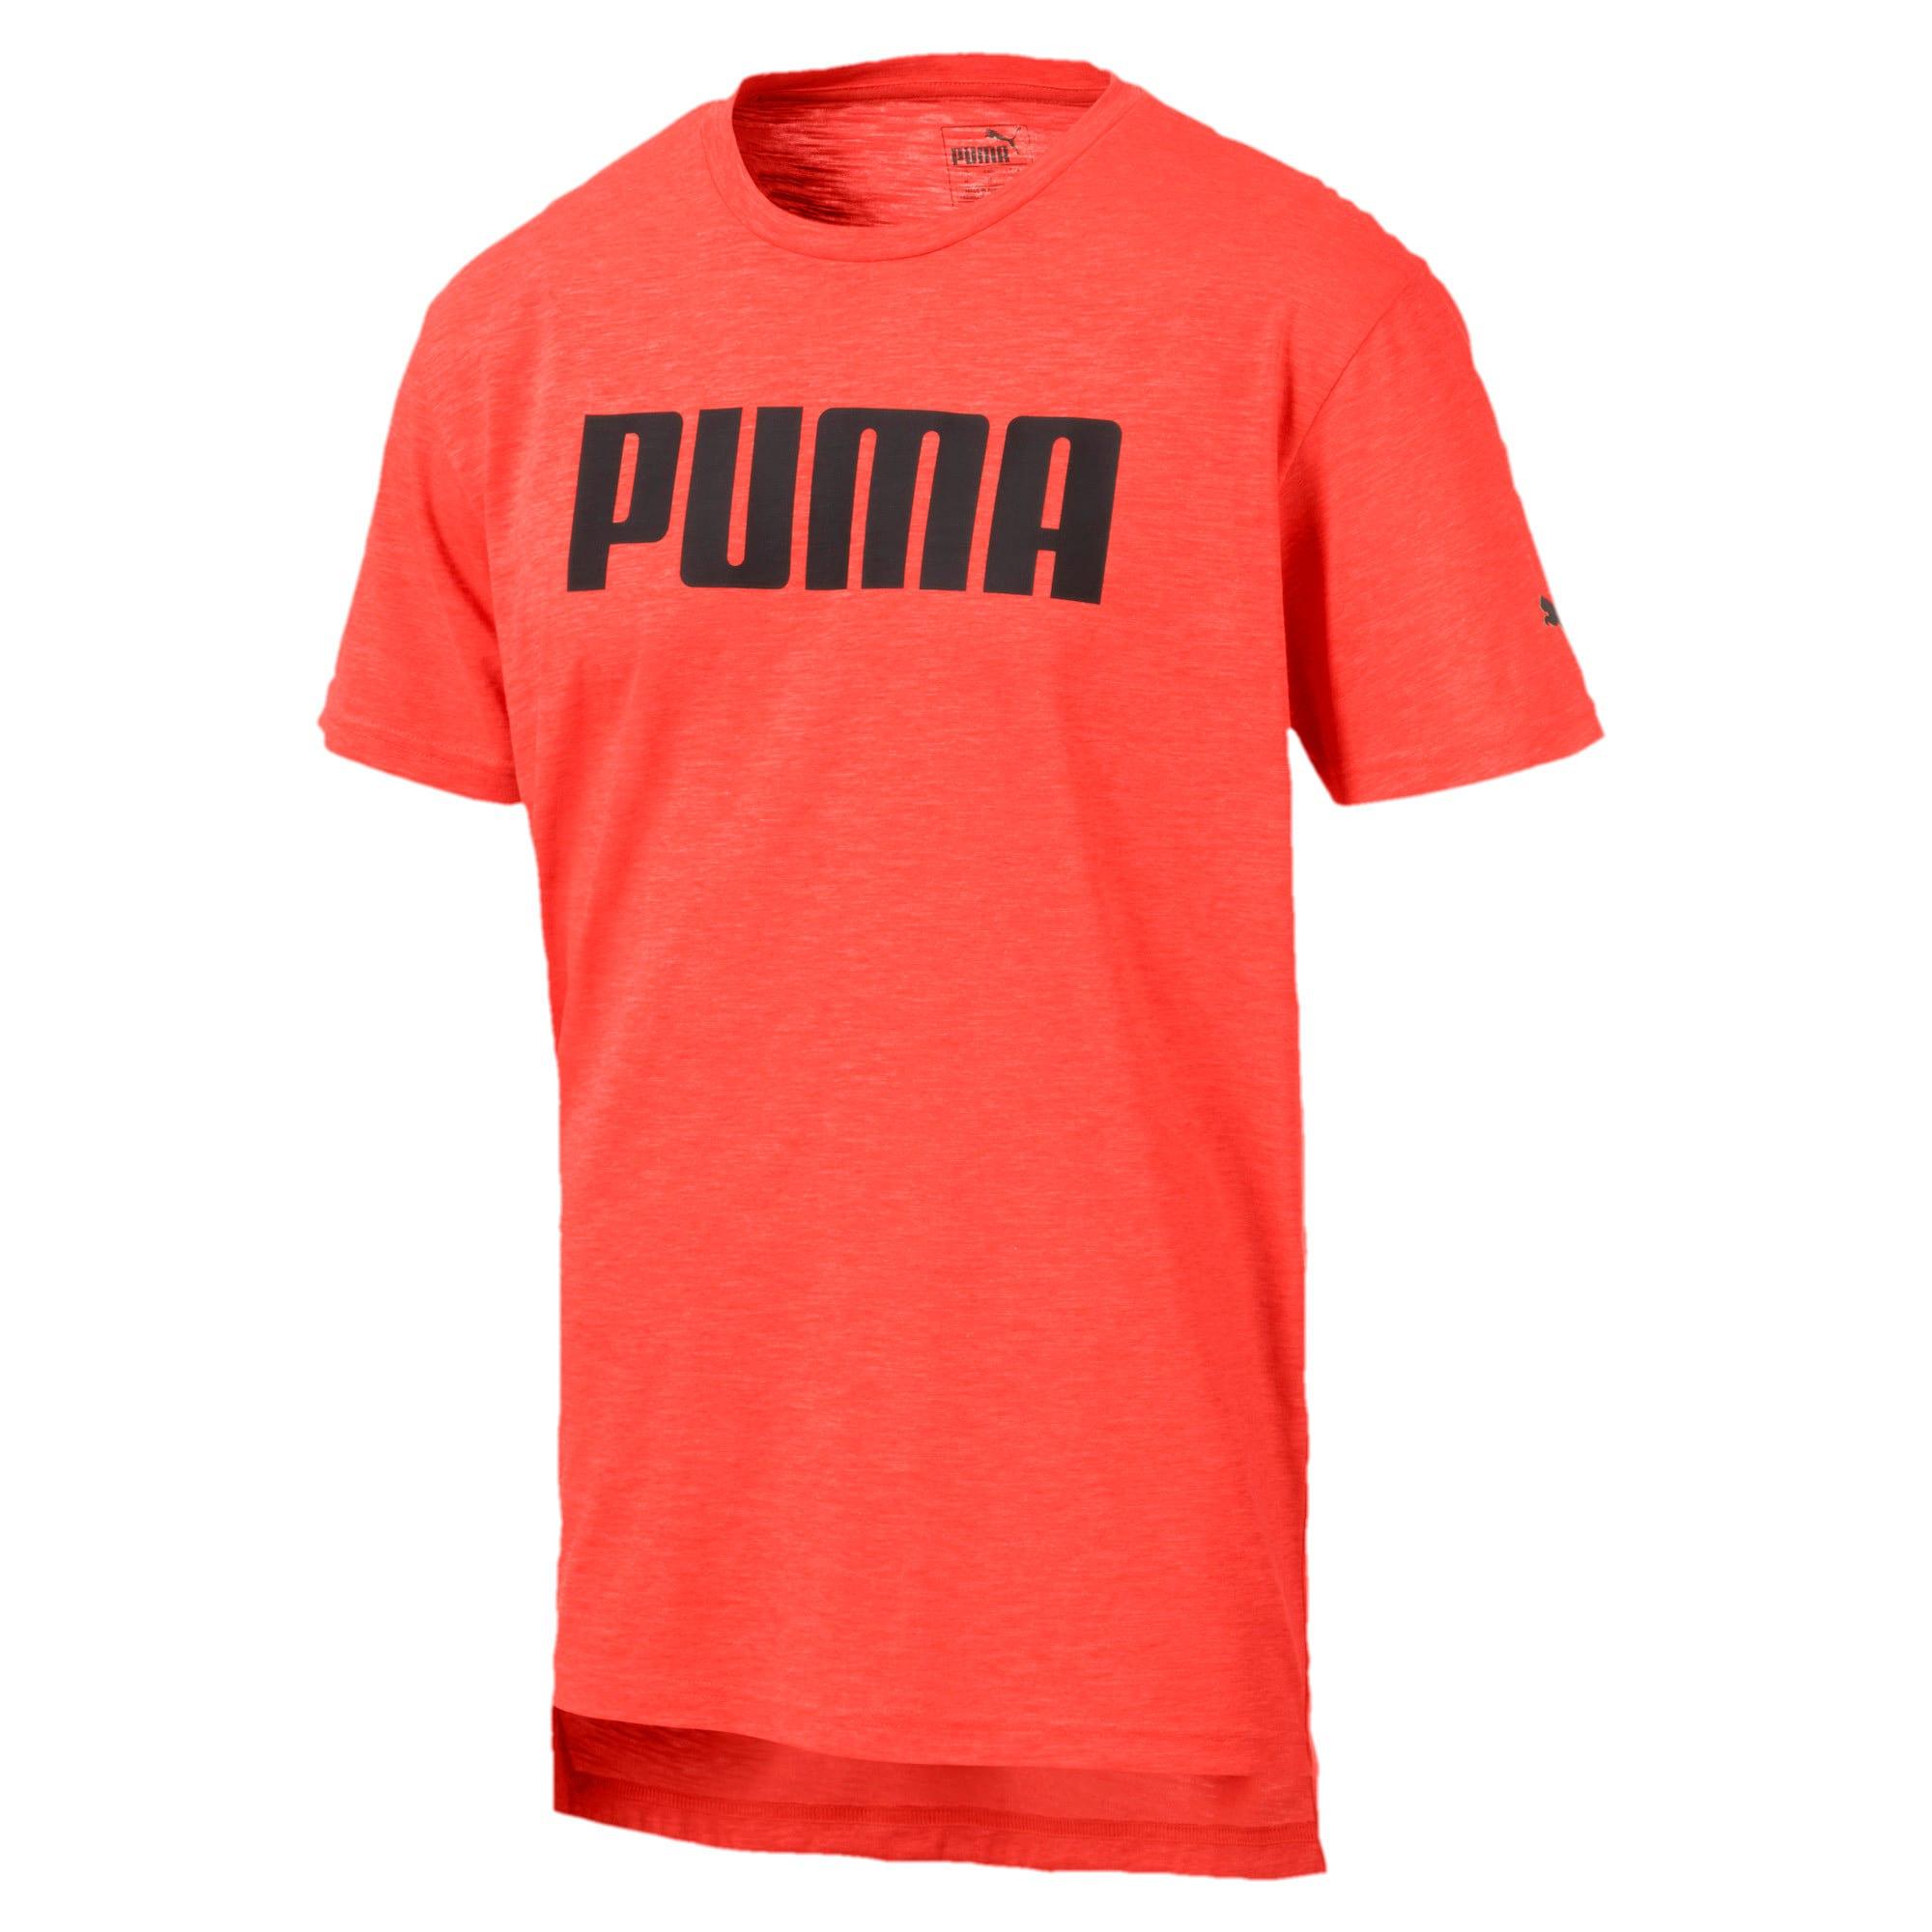 Thumbnail 4 of PUMA Men's Graphic Tee, Nrgy Red Heather, medium